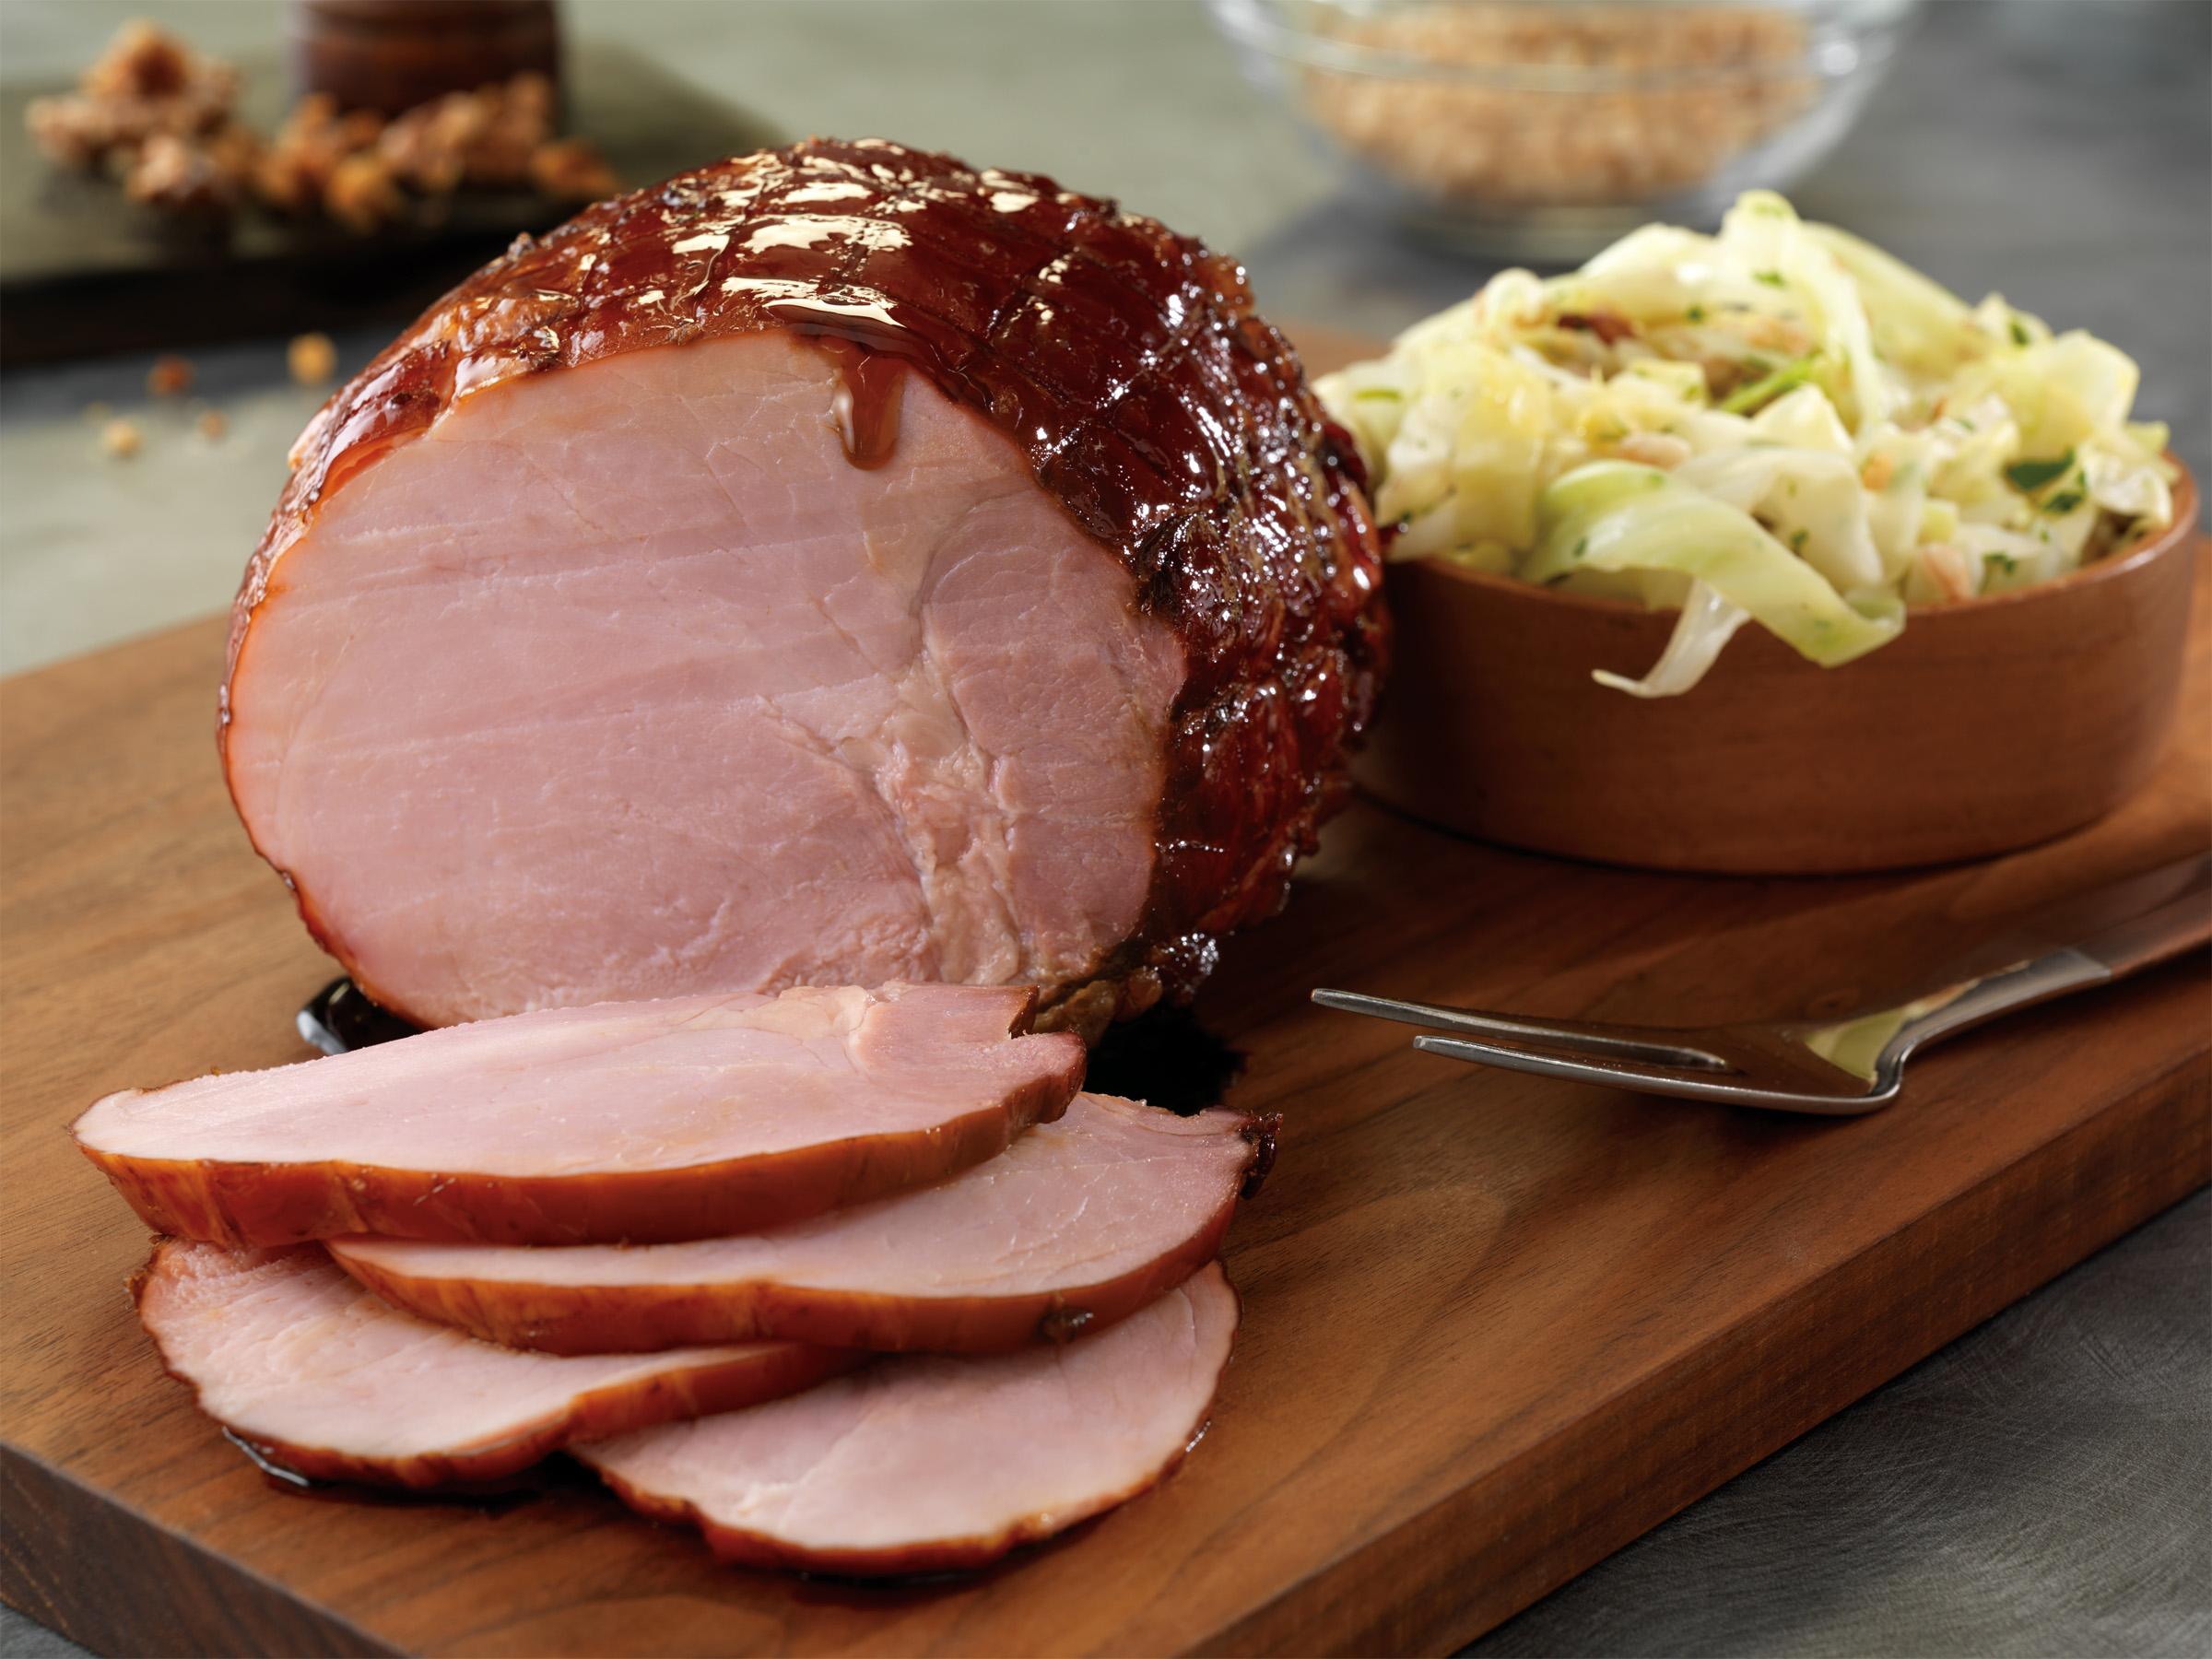 Photo credit: National Pork Board